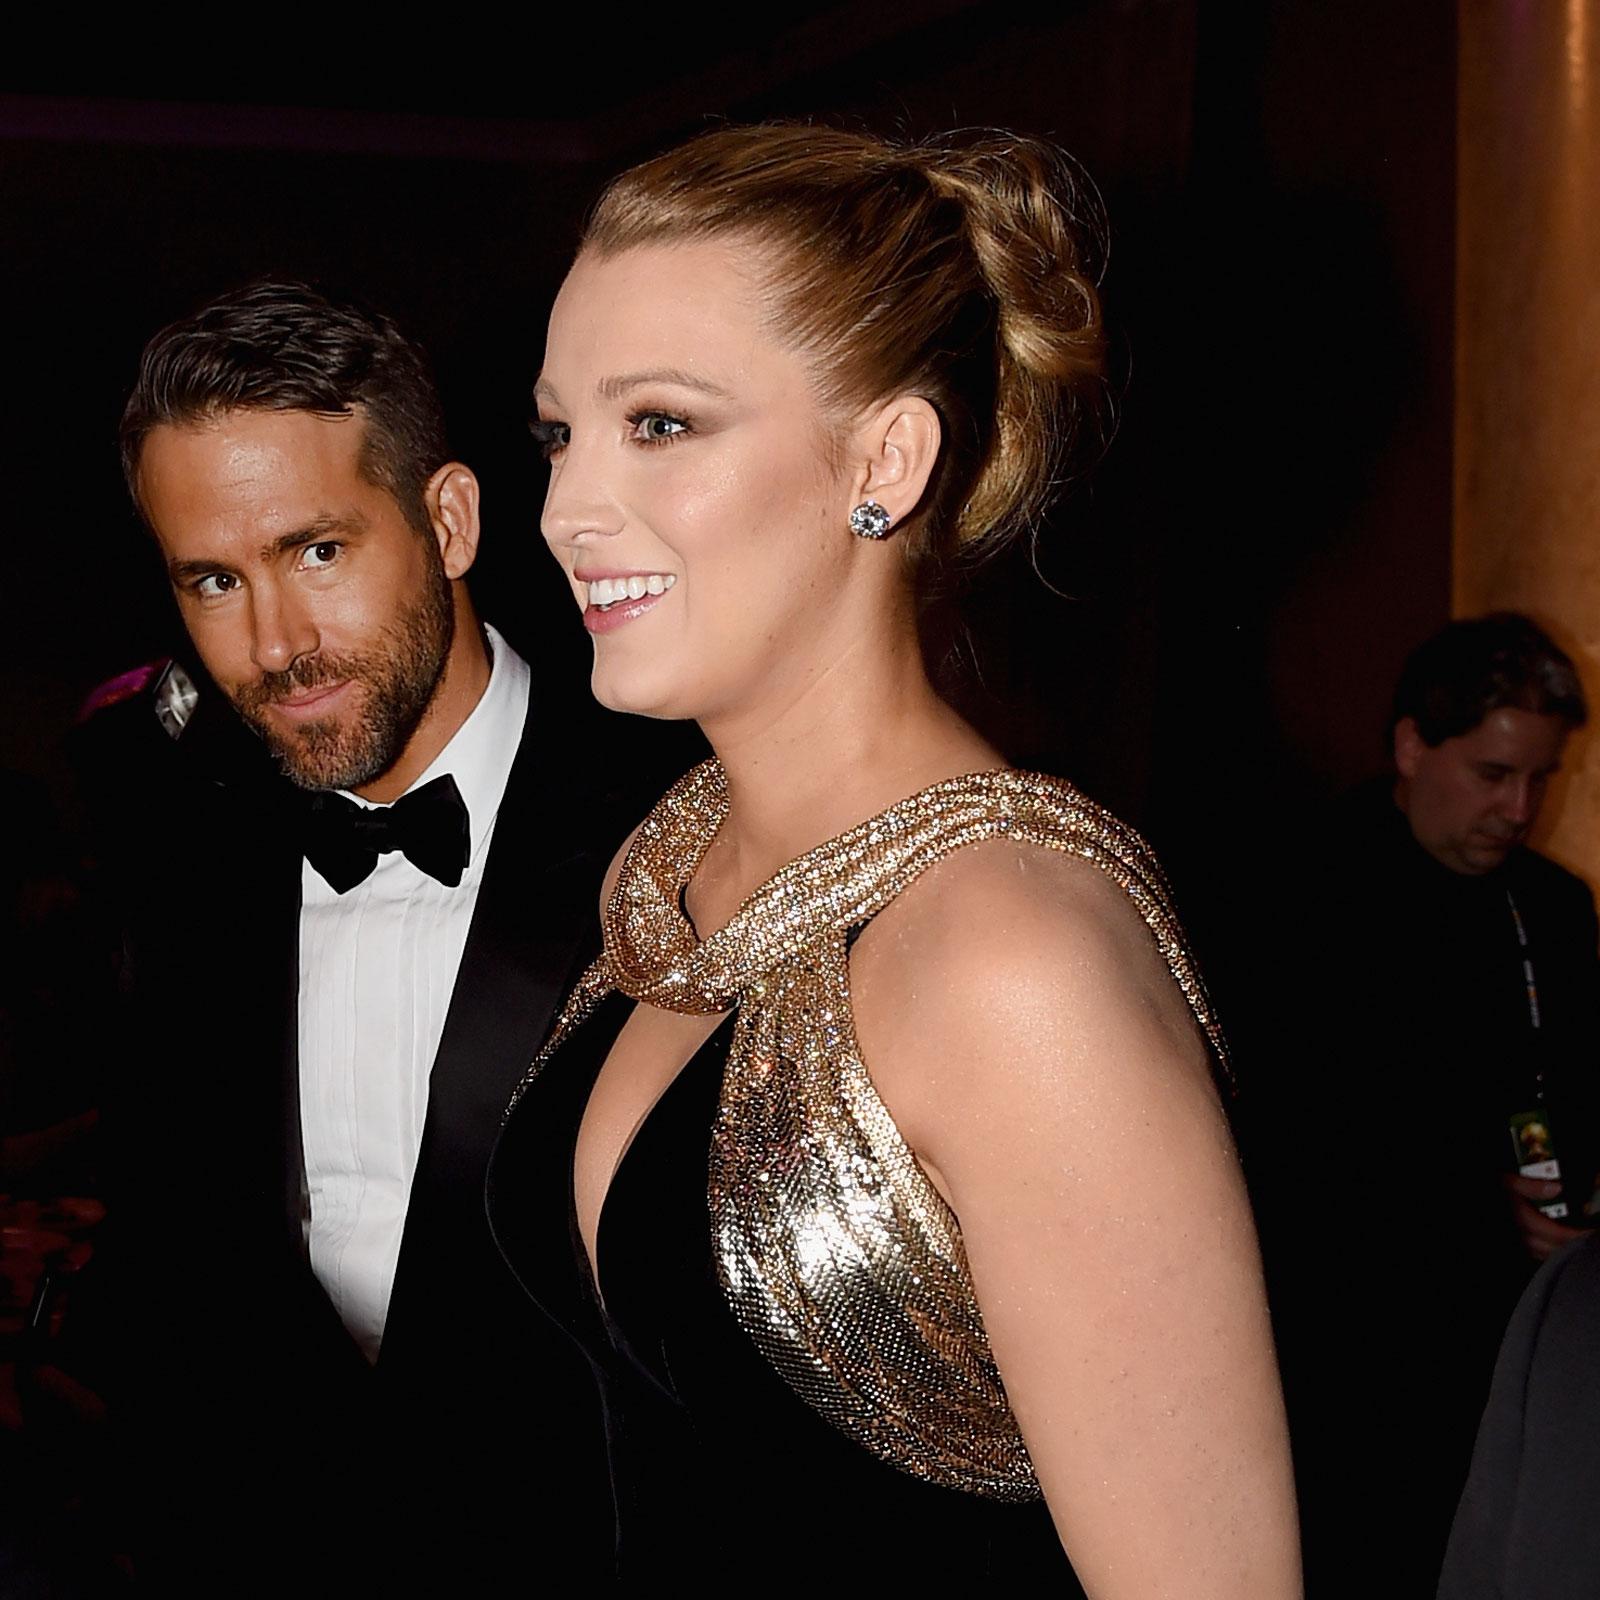 Blake Lively, peinado Golden Globes